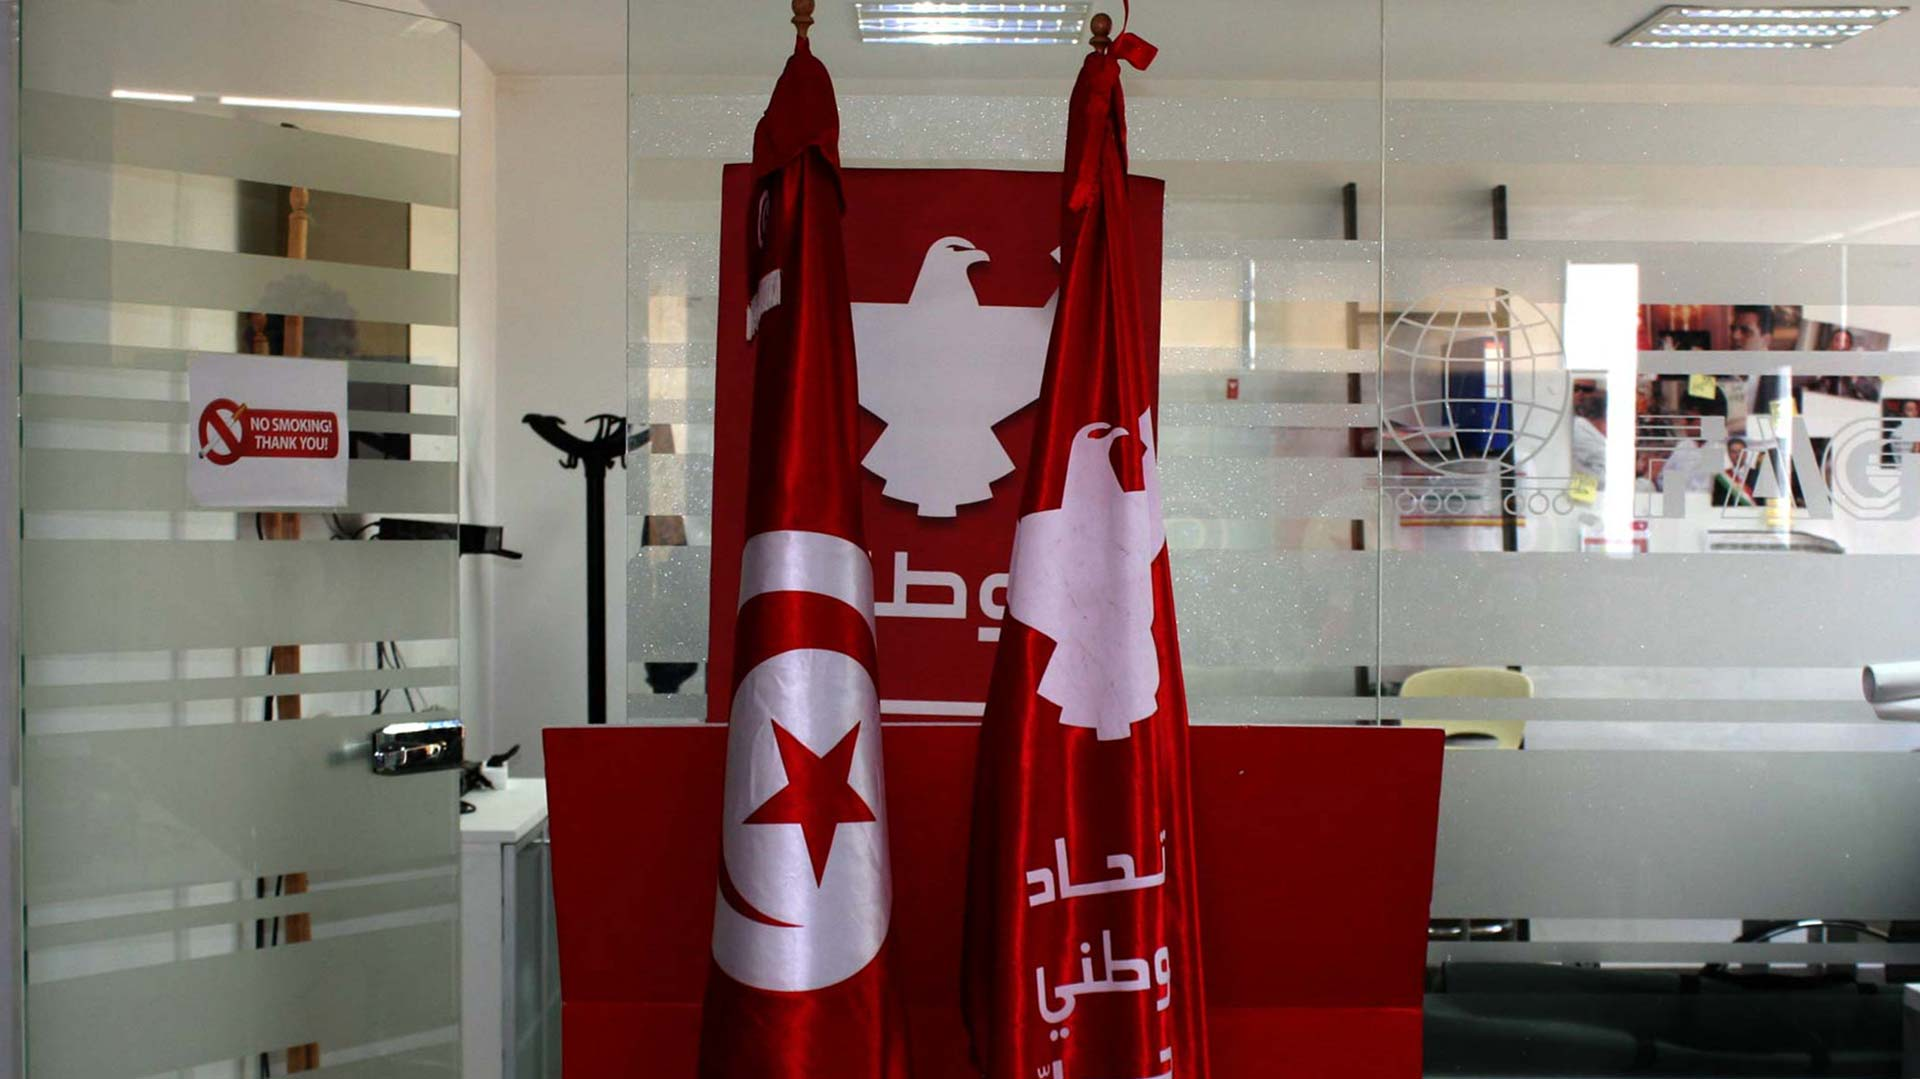 16-tnelec2014-presidentielle-upl-drapeau-1920-inkyfada